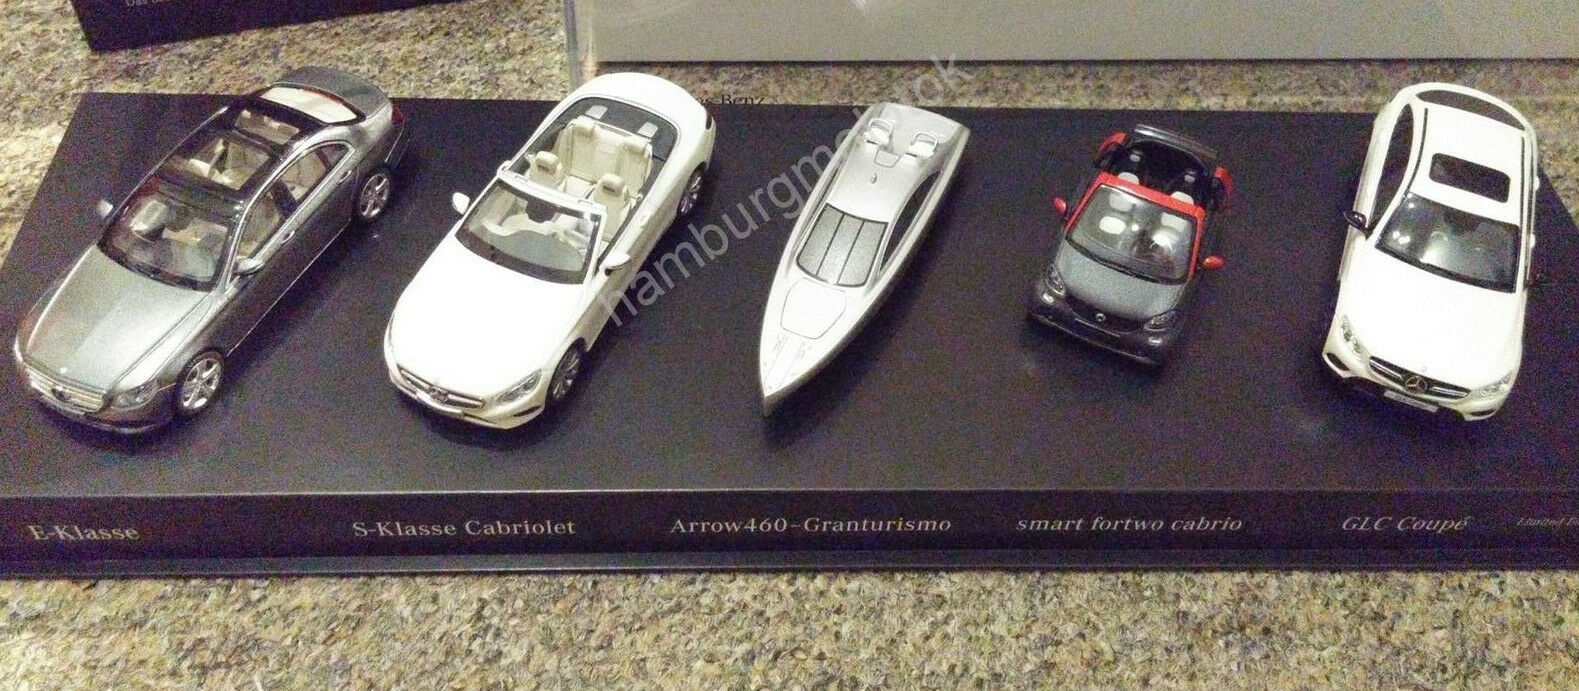 Set Mercedes 1 43 2016 w213 a217 a453 c253 MINIMAX KYOSHO NOREV ARROW